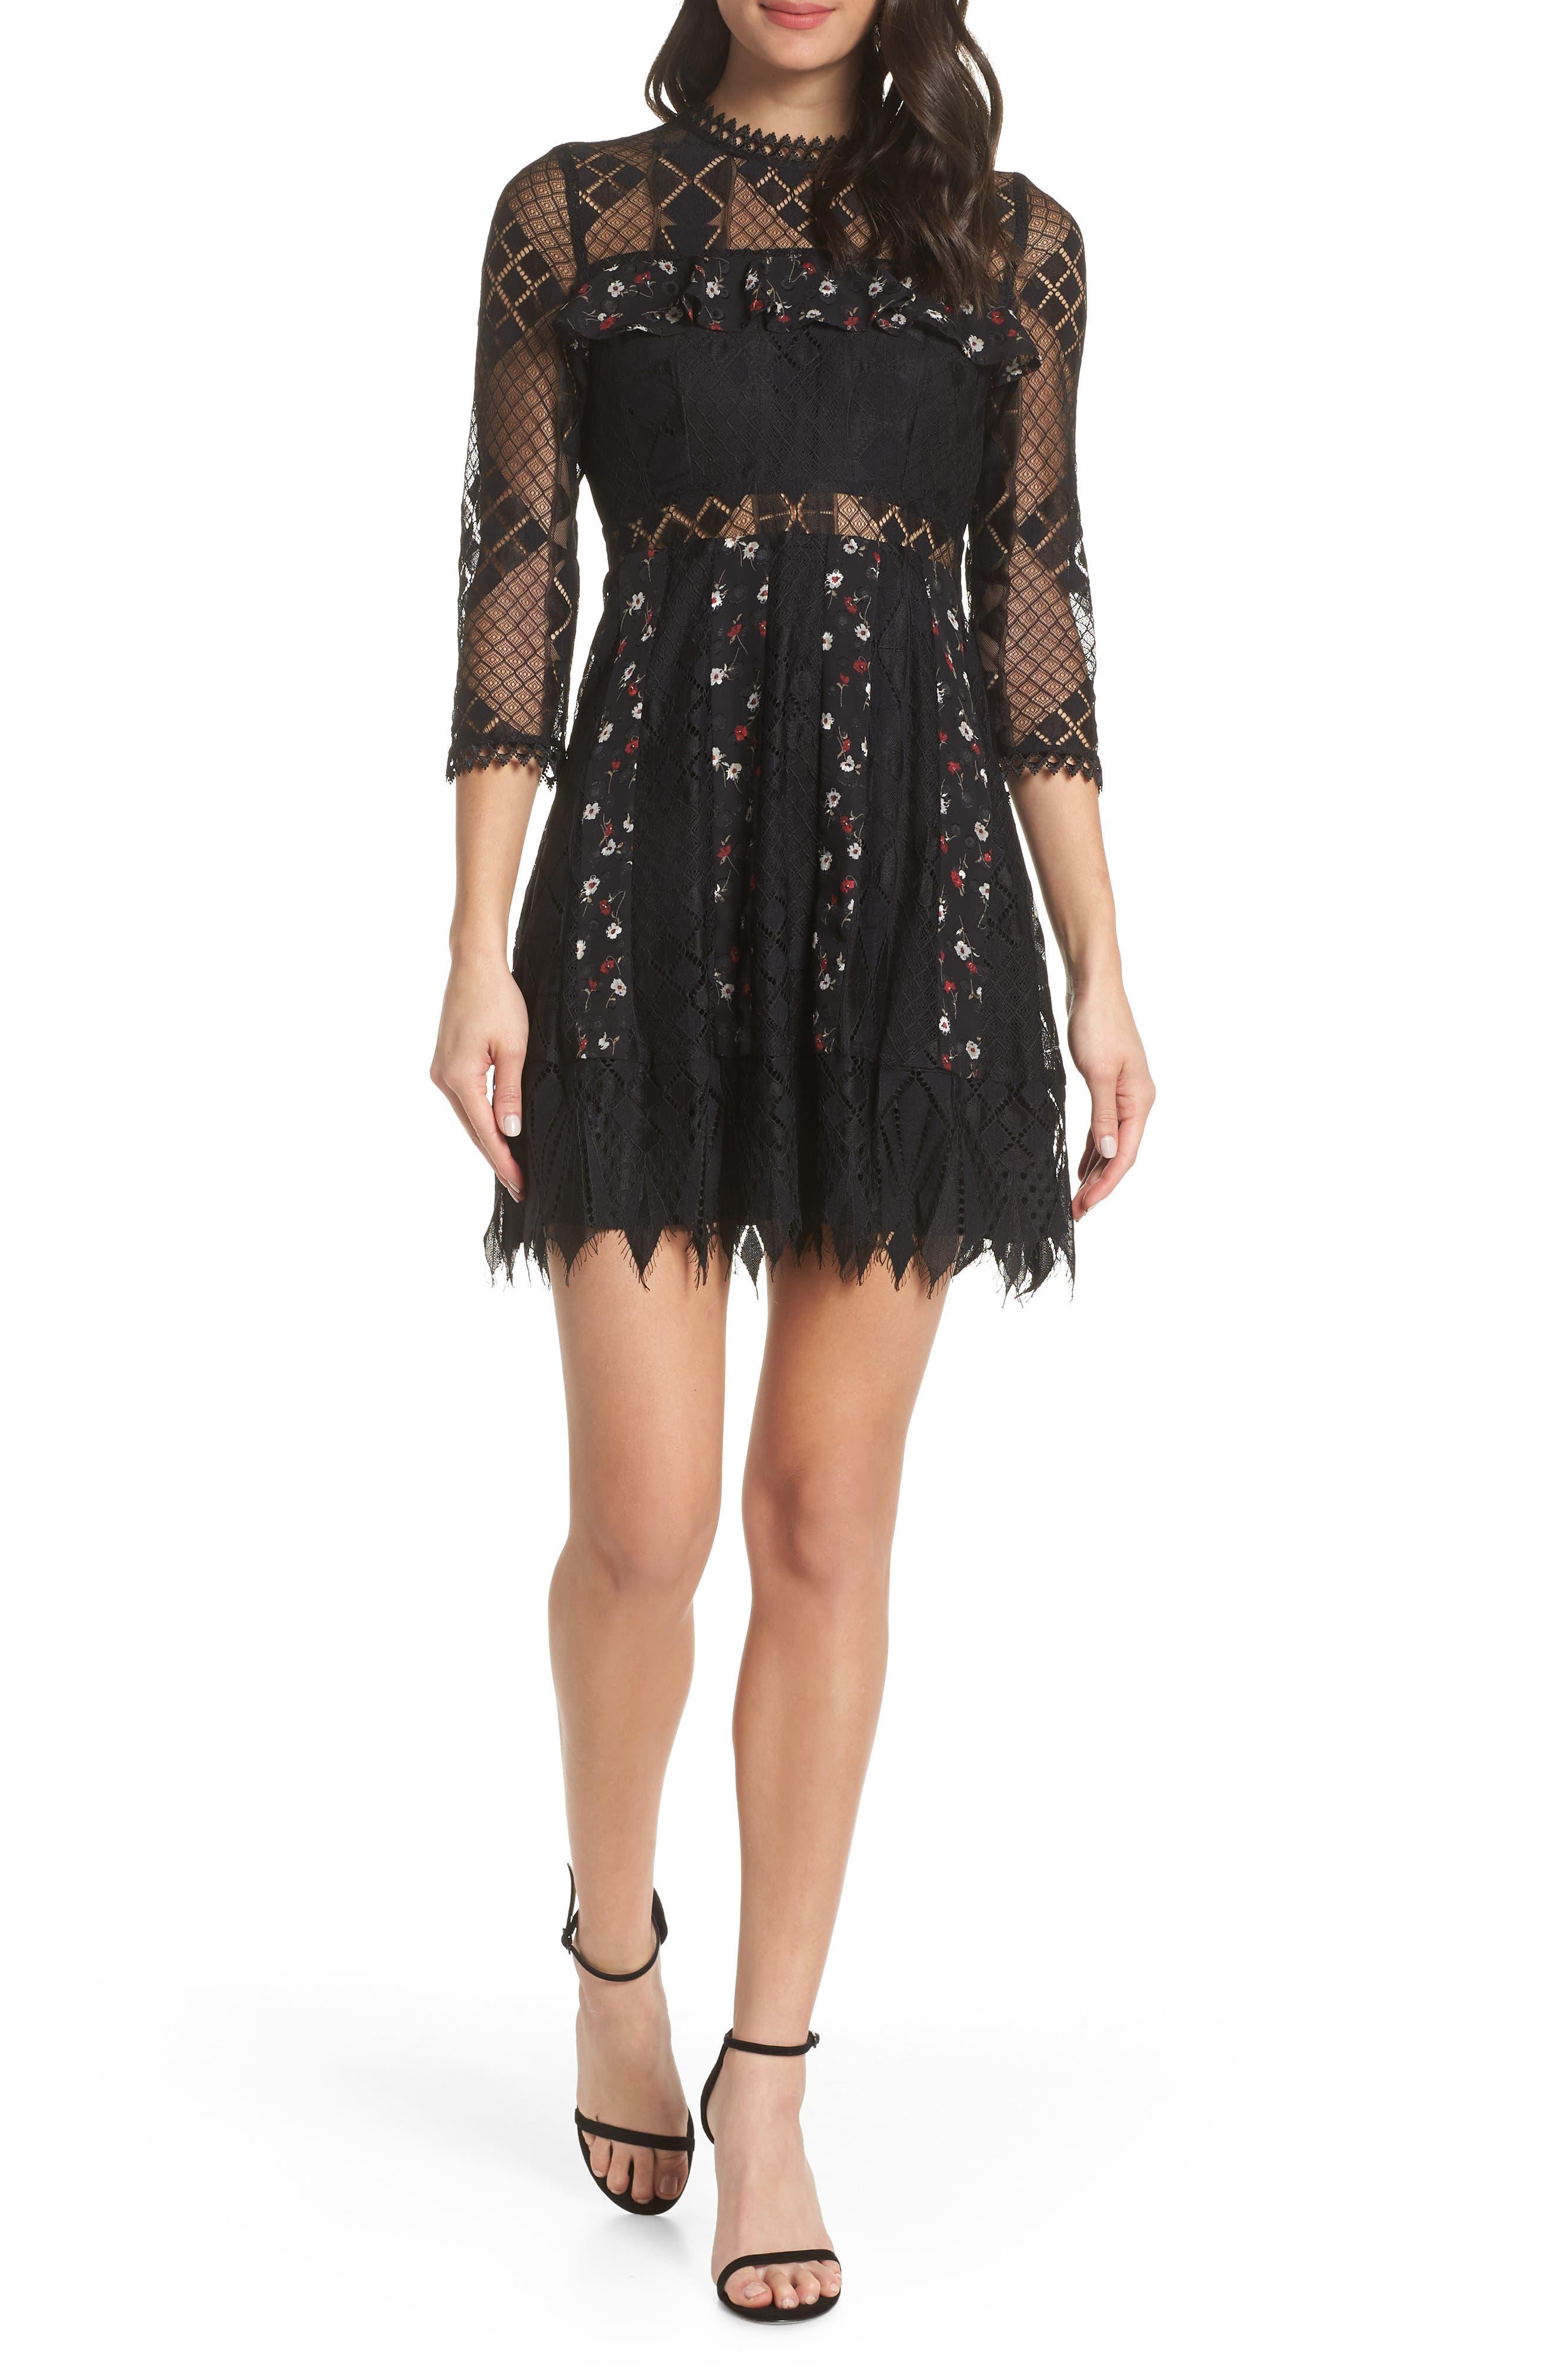 Foxiedox Josefine Lace & Clip Dot Cocktail Dress, Black